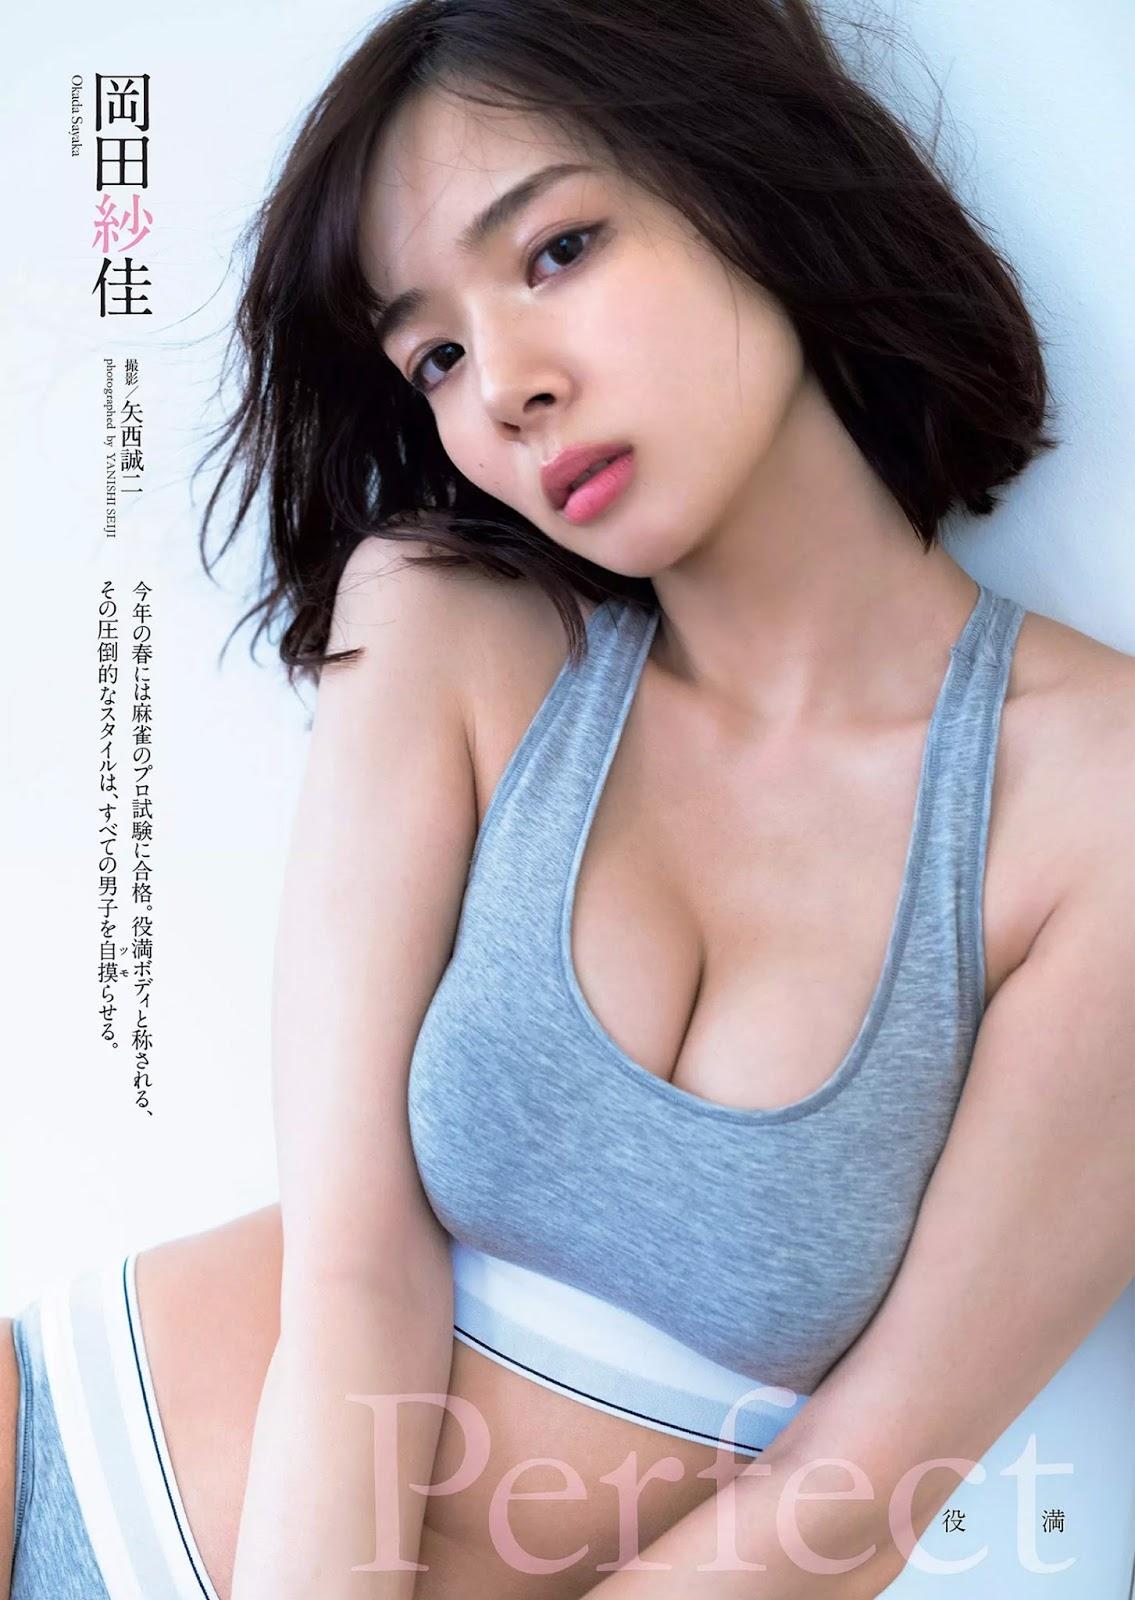 Sayaka Okada 岡田紗佳, Weekly Playboy 2017 No.50 (週刊プレイボーイ 2017年50号)